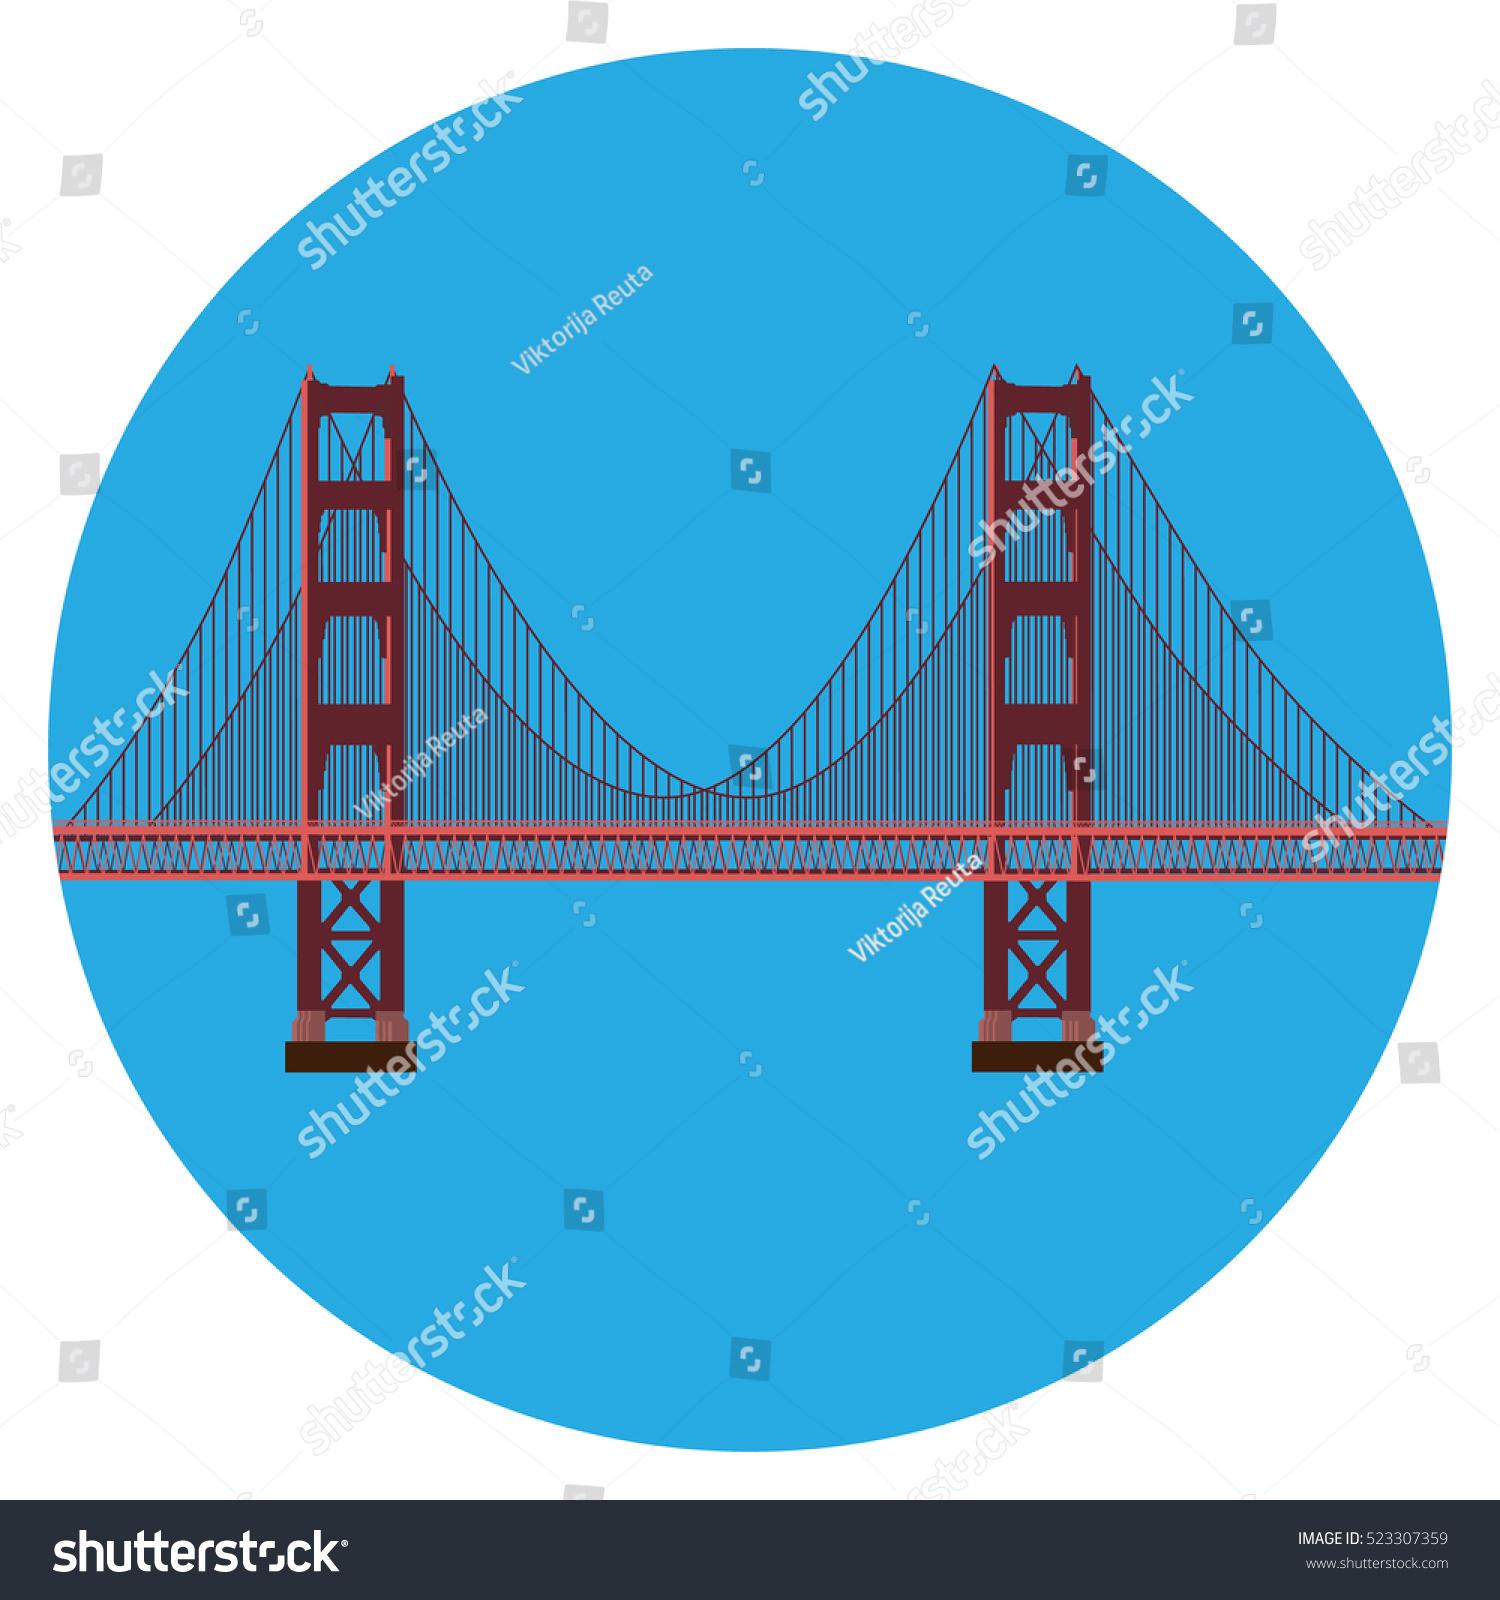 Vector Illustration San Francisco Golden Gate Stock Royalty Bridge Diagram Of The Symbol Isolated On White Background Us Landmark